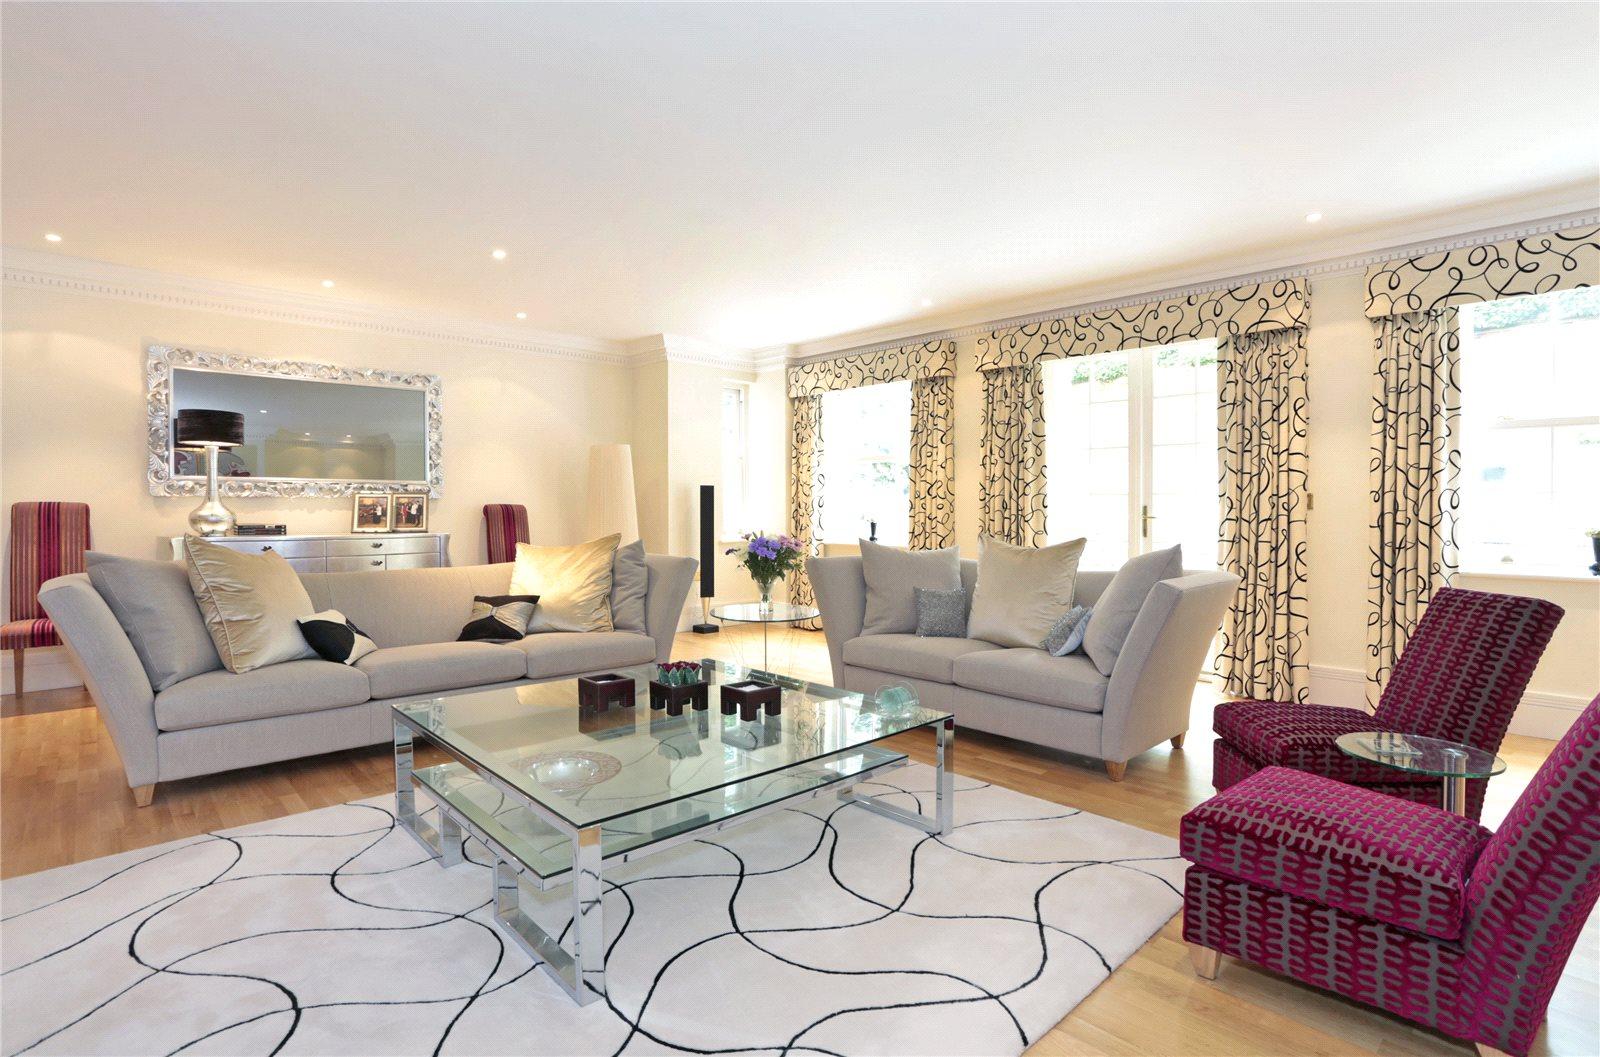 Additional photo for property listing at Top Park, Gerrards Cross, Buckinghamshire, SL9 Gerrards Cross, Inghilterra